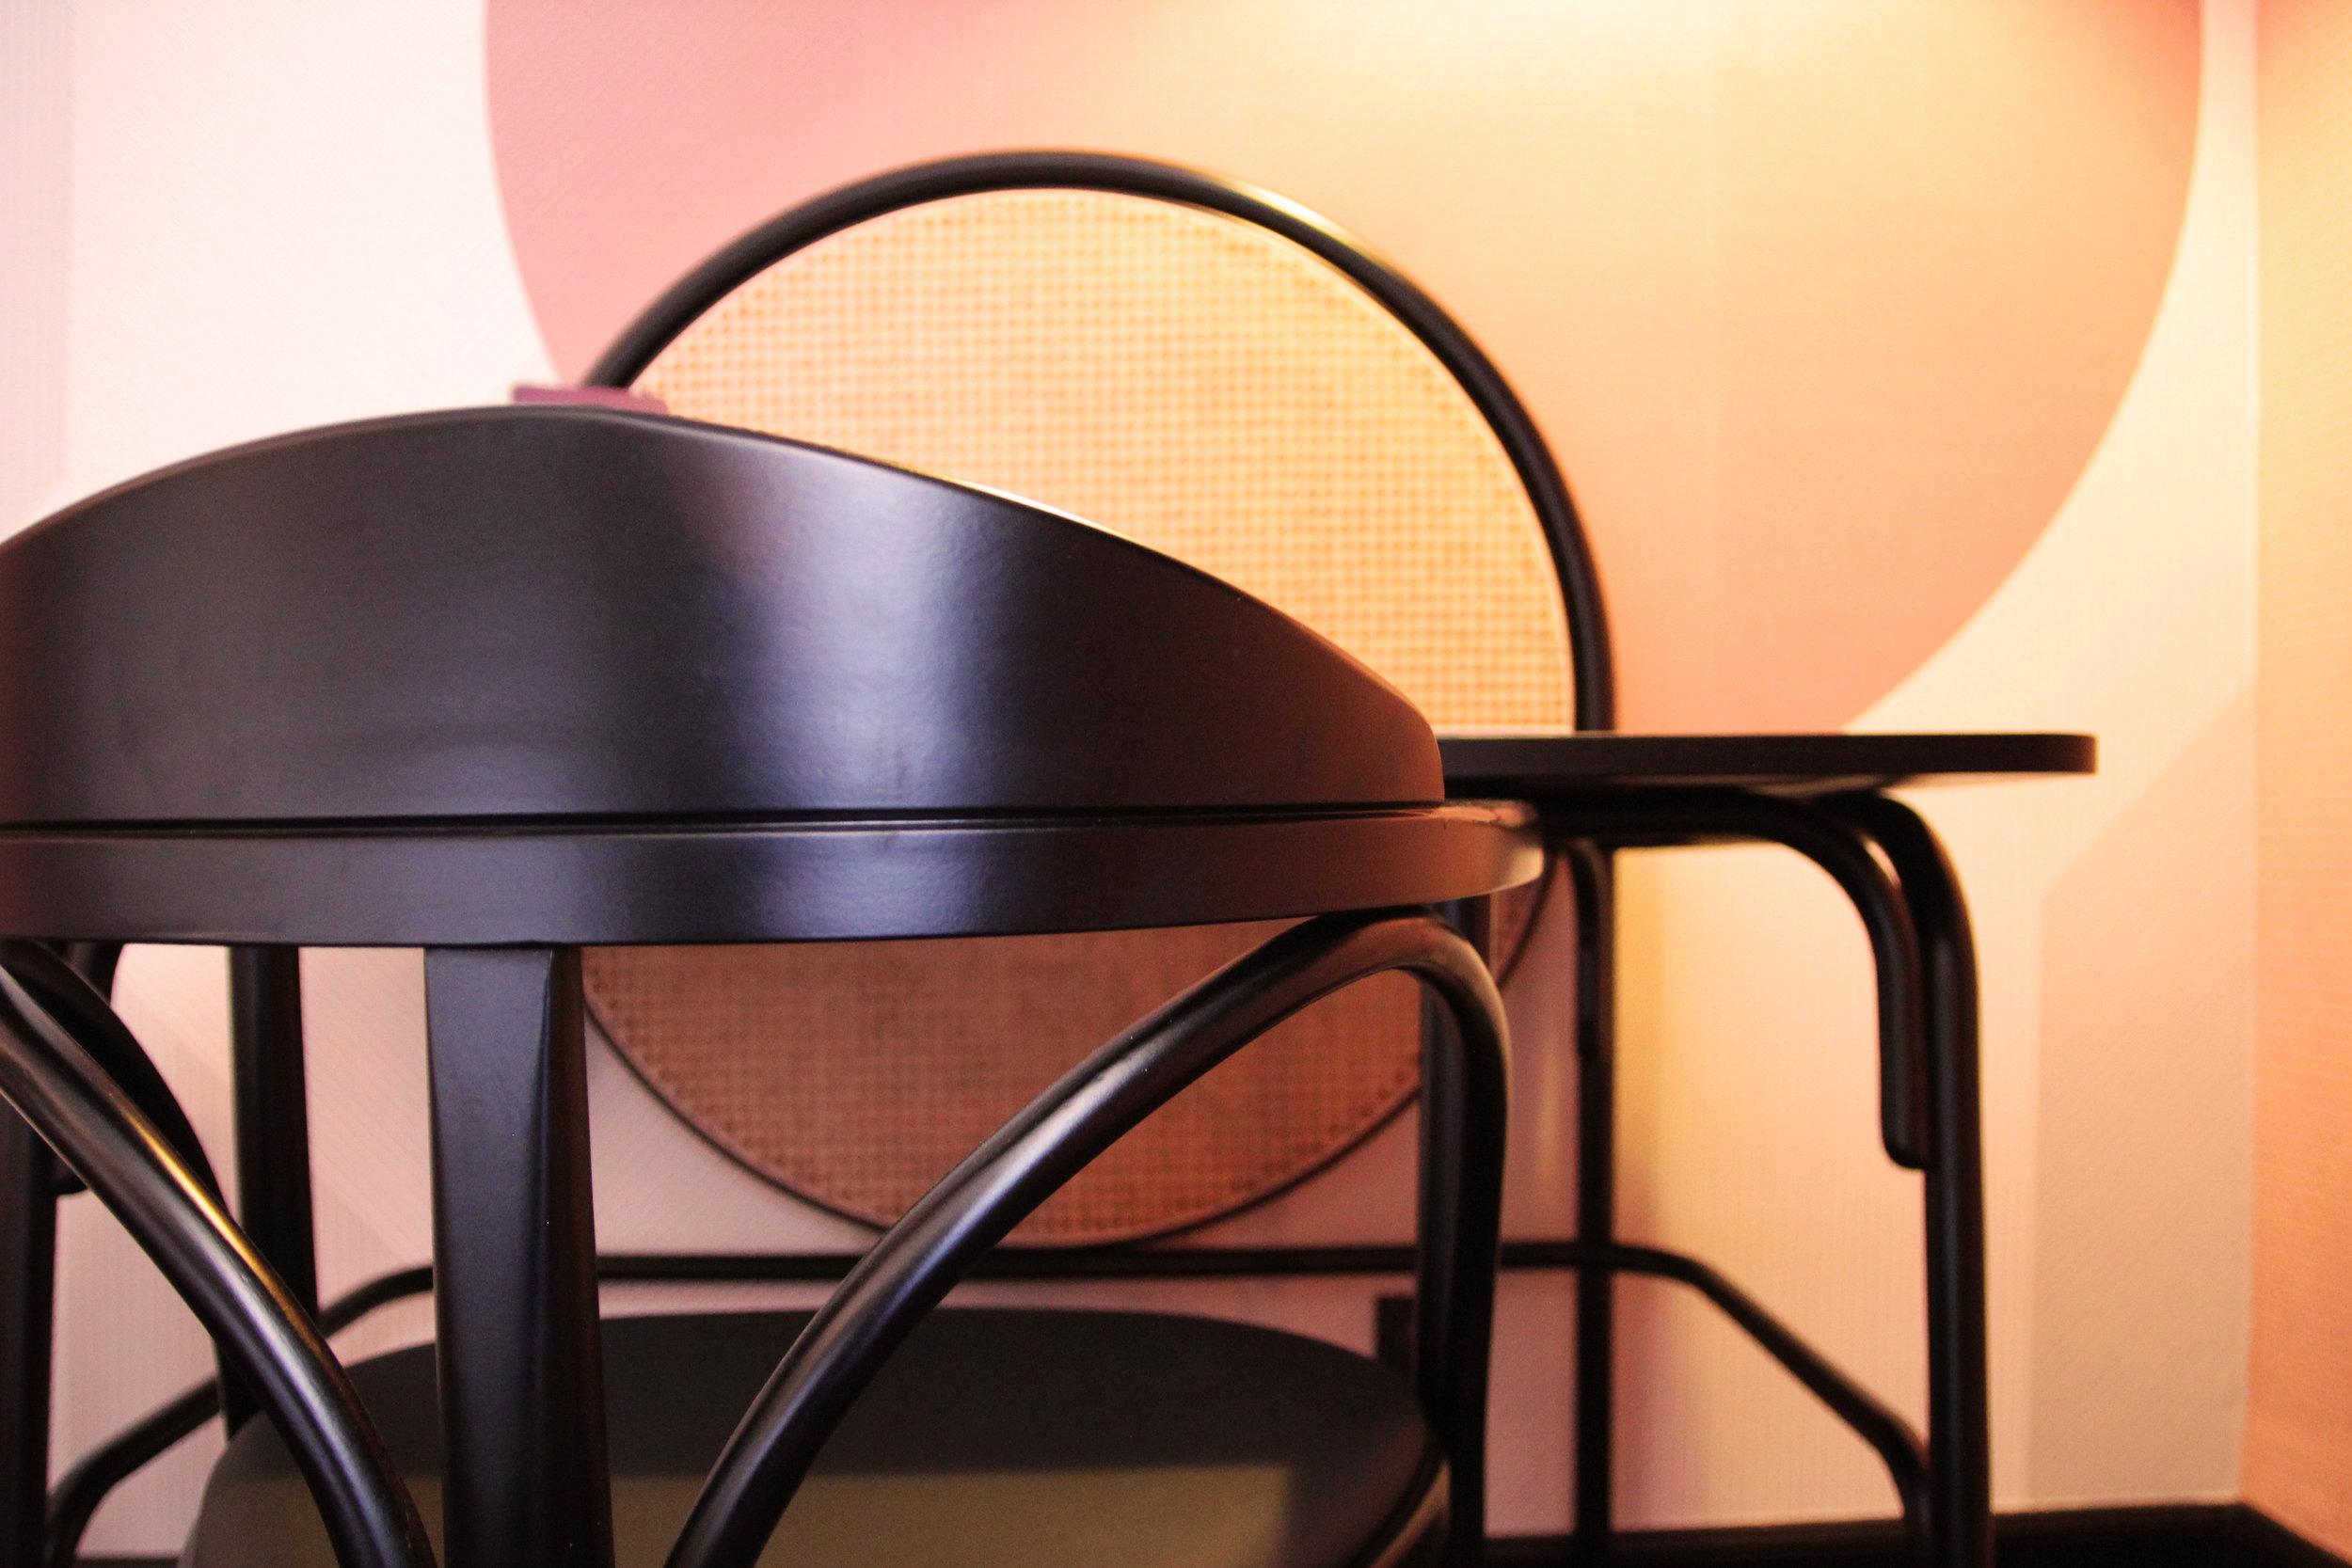 Wood & Cannage - The desk // Le bureau - Bois & Cannage